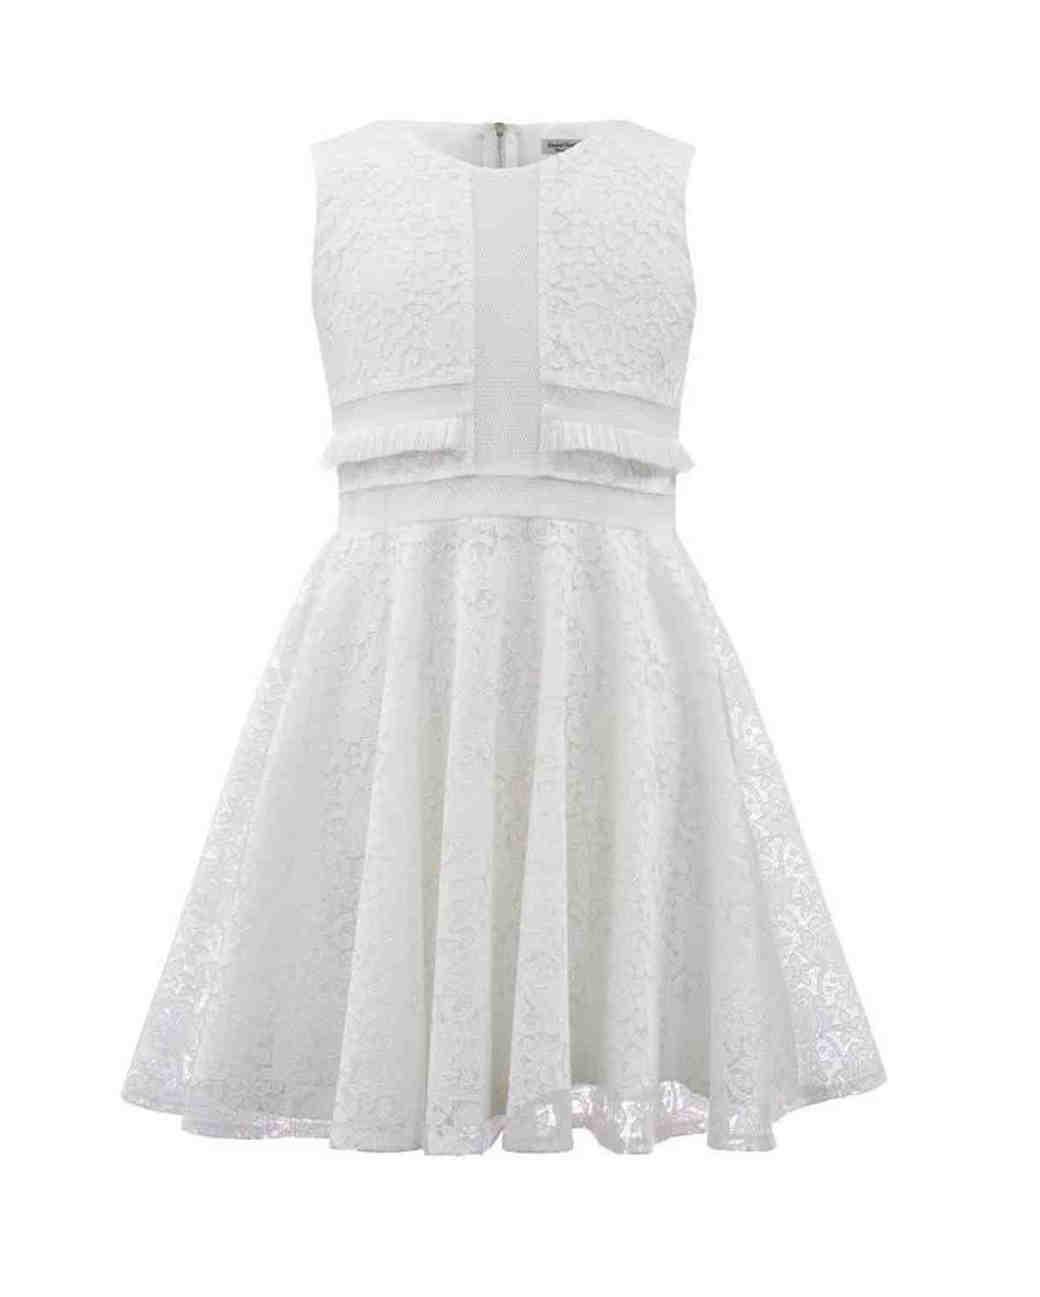 David Charles Ivory Floral Dress